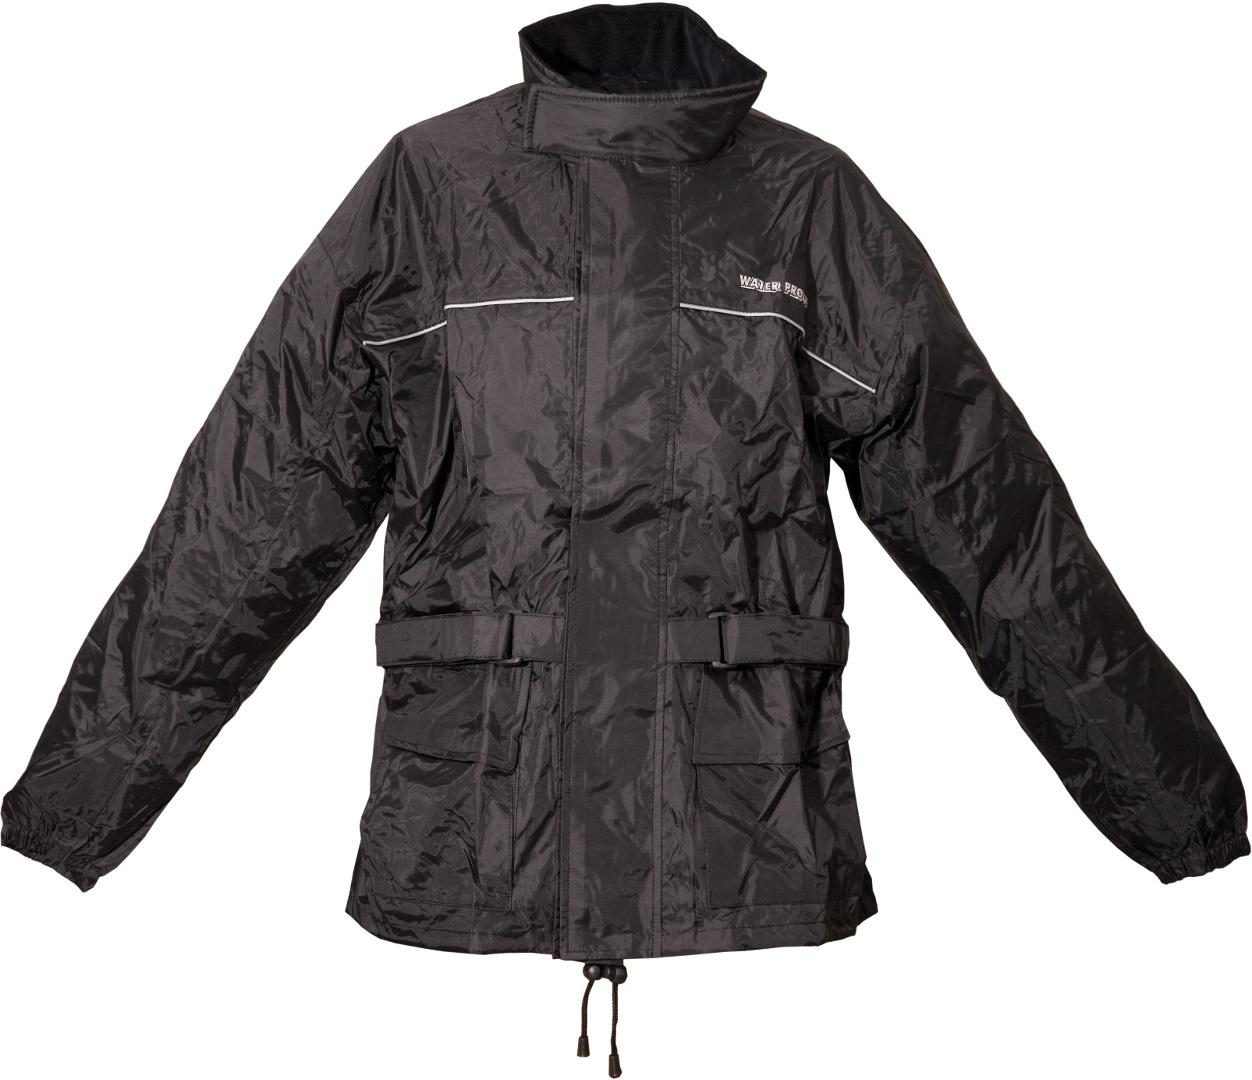 Modeka Regenjacke, schwarz, Größe 6XL, schwarz, Größe 6XL